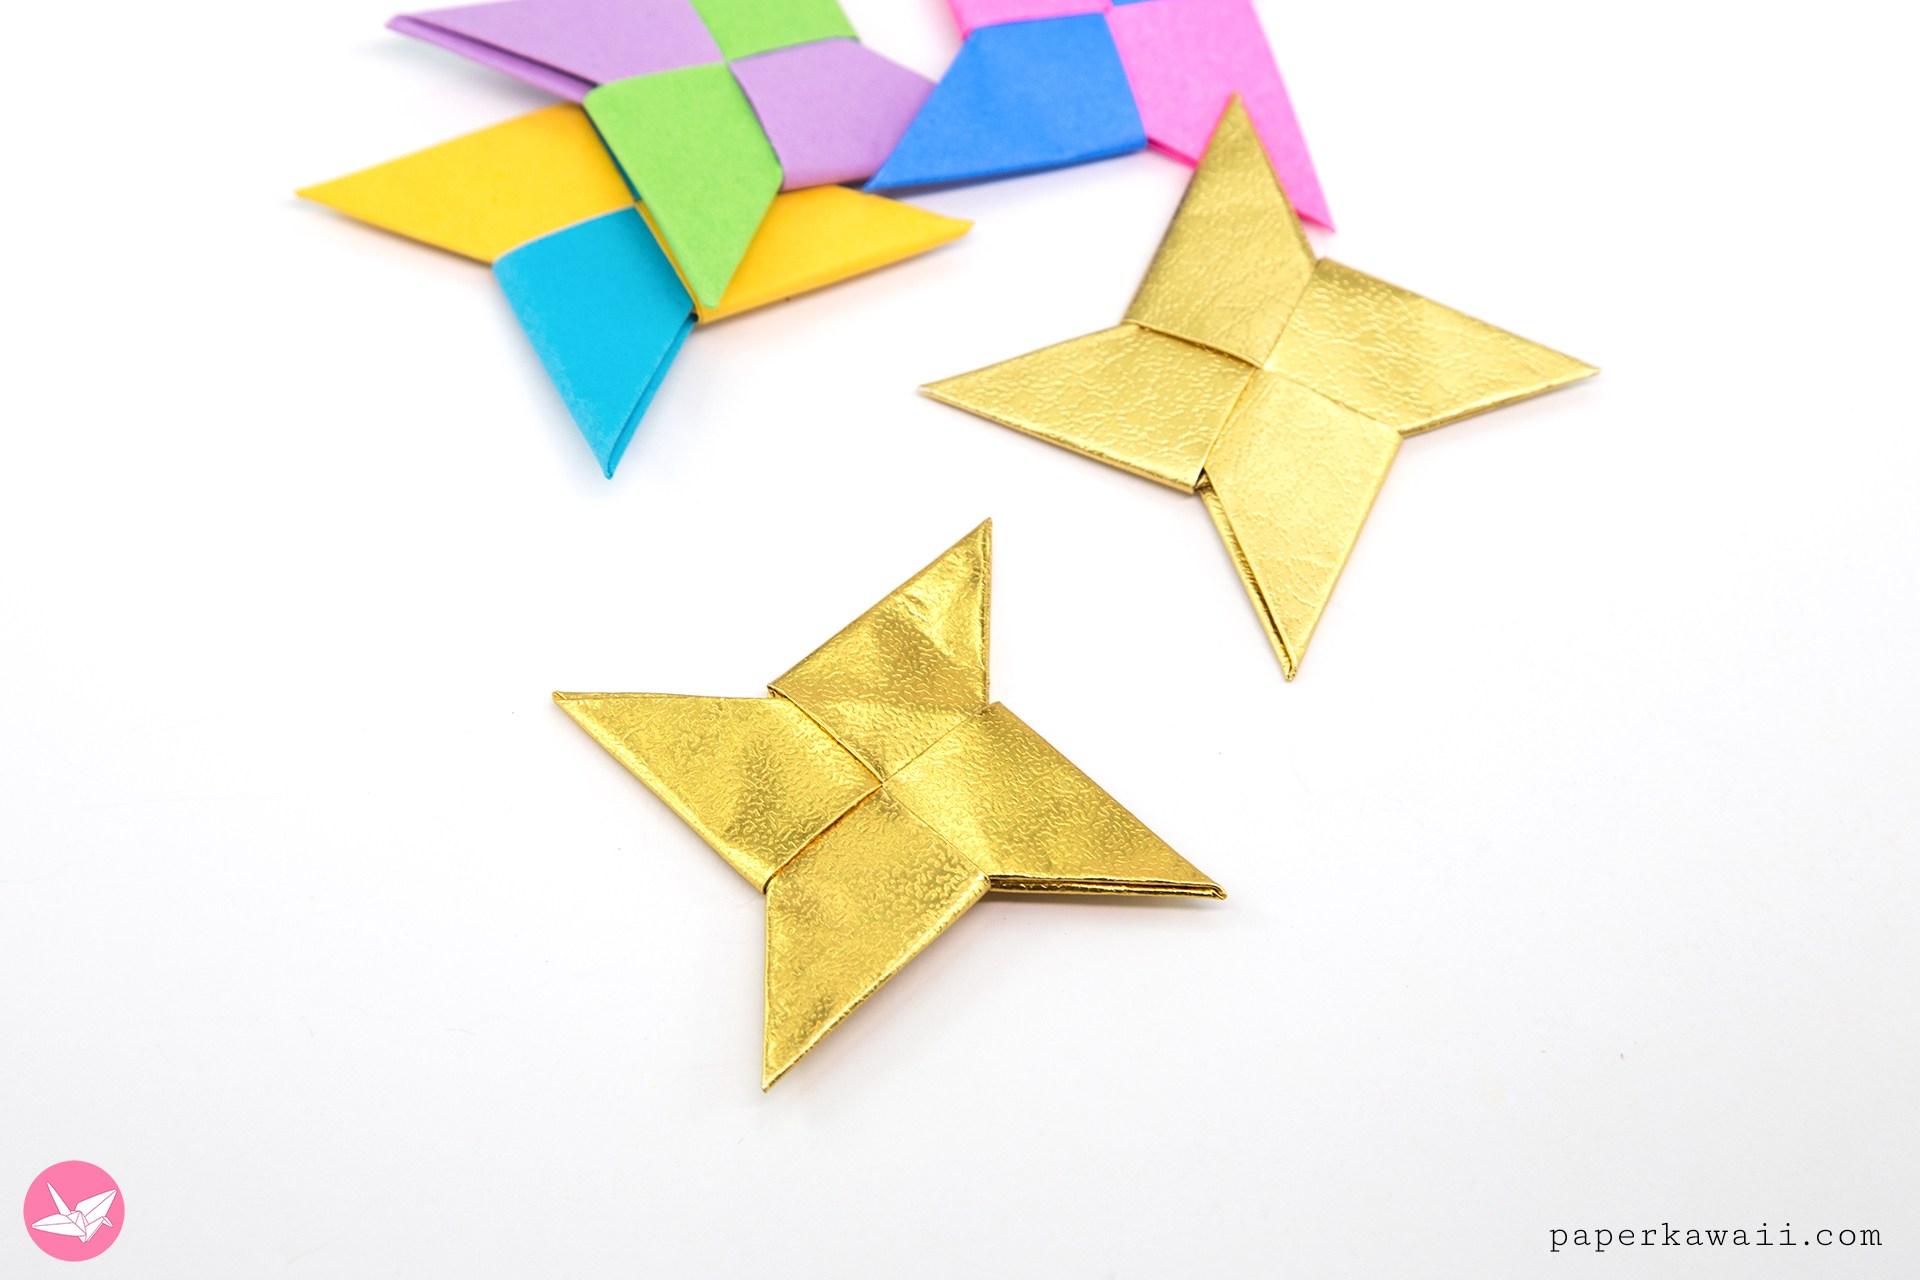 origami-ninja-star-shuriken-paper-kawaii-05